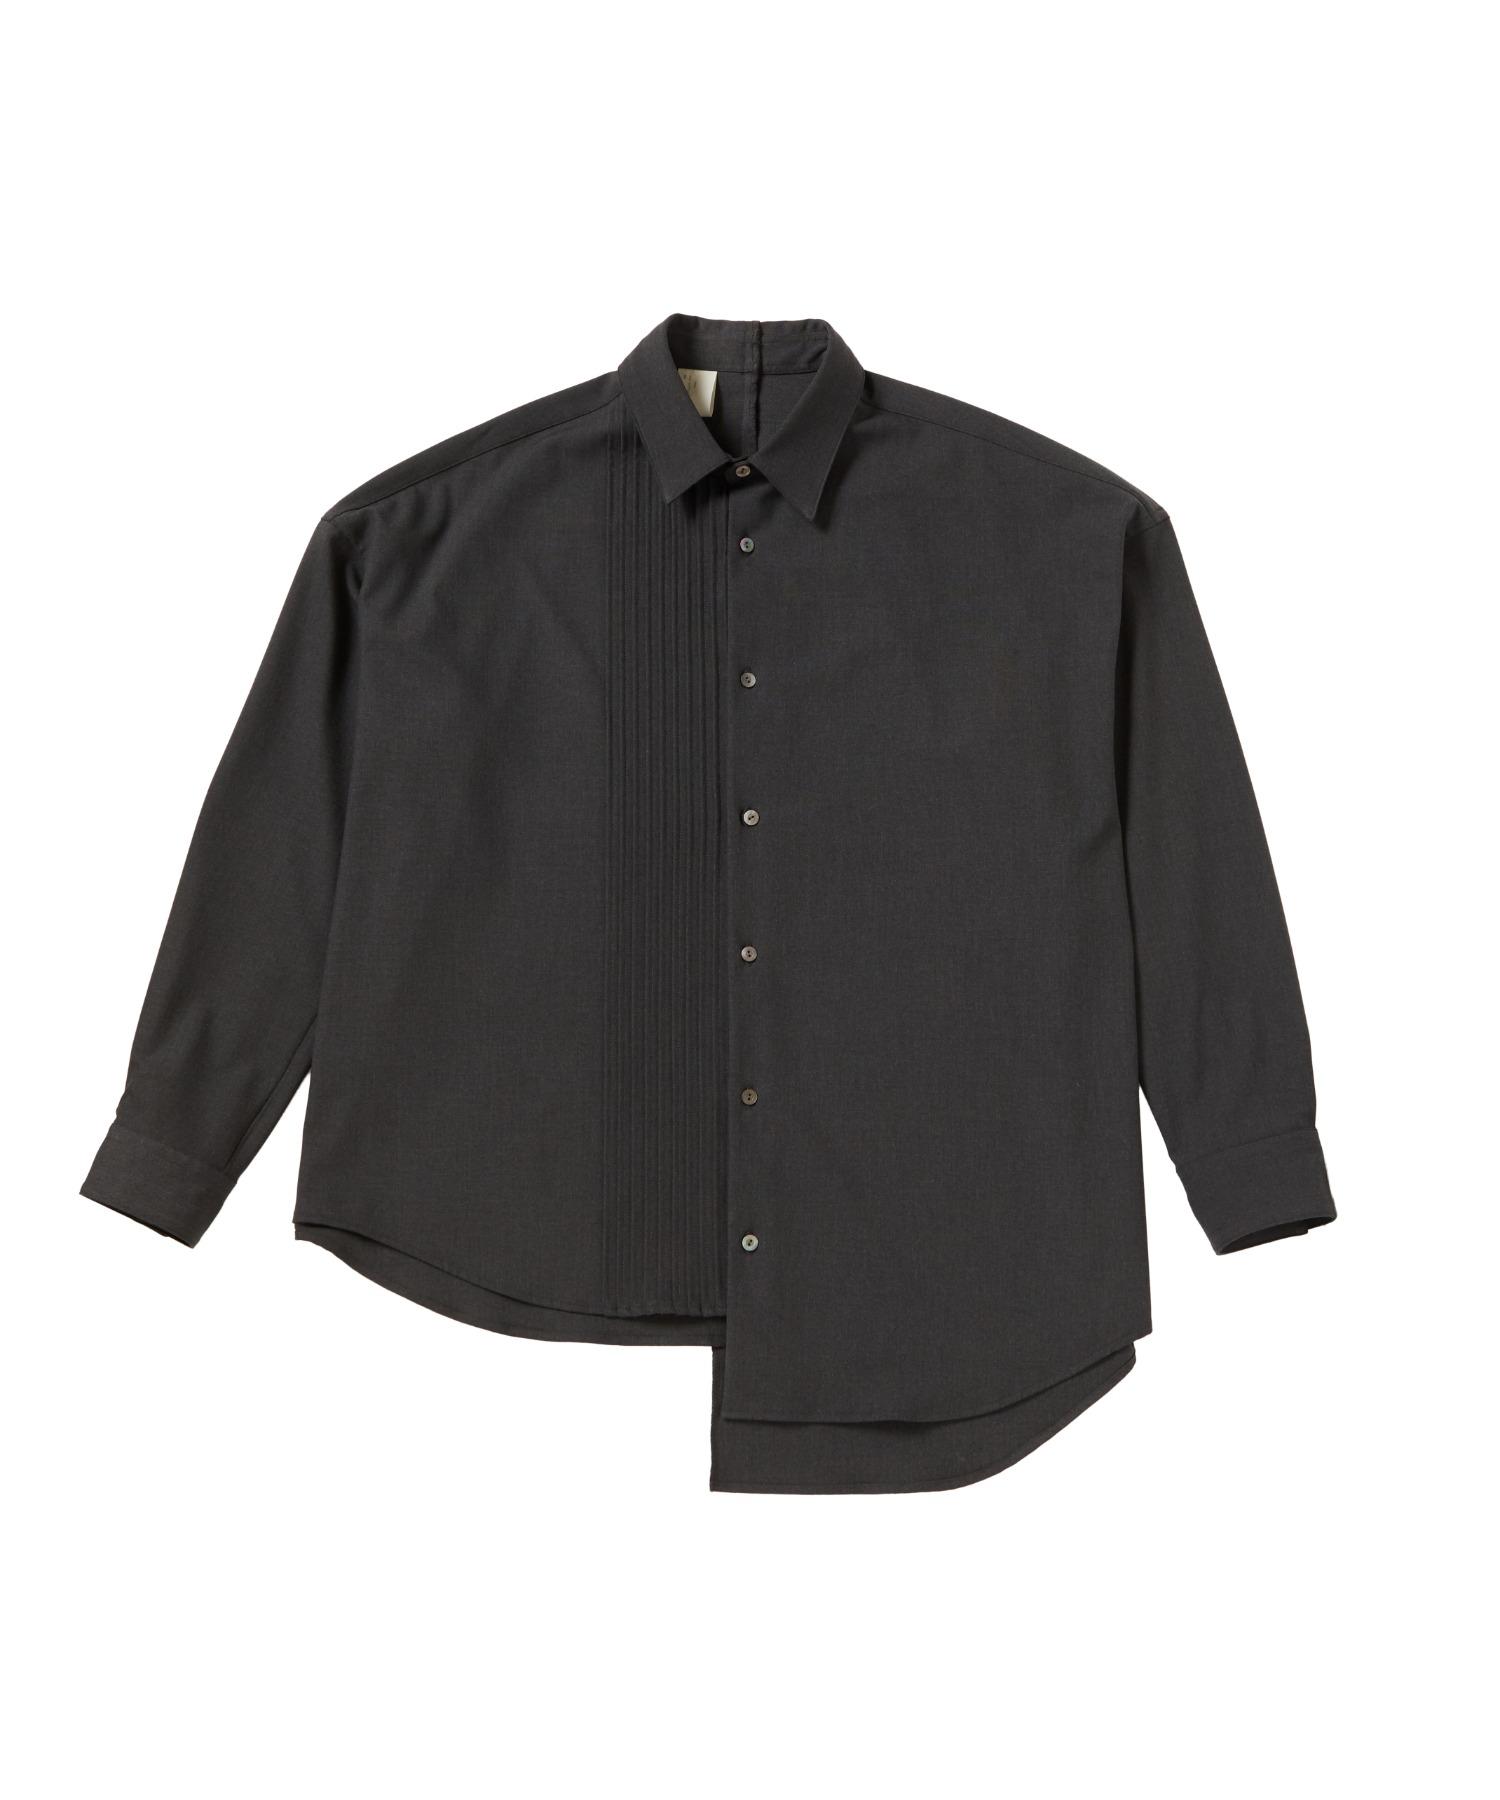 FALL2020 PLEATED DRESS SHIRT